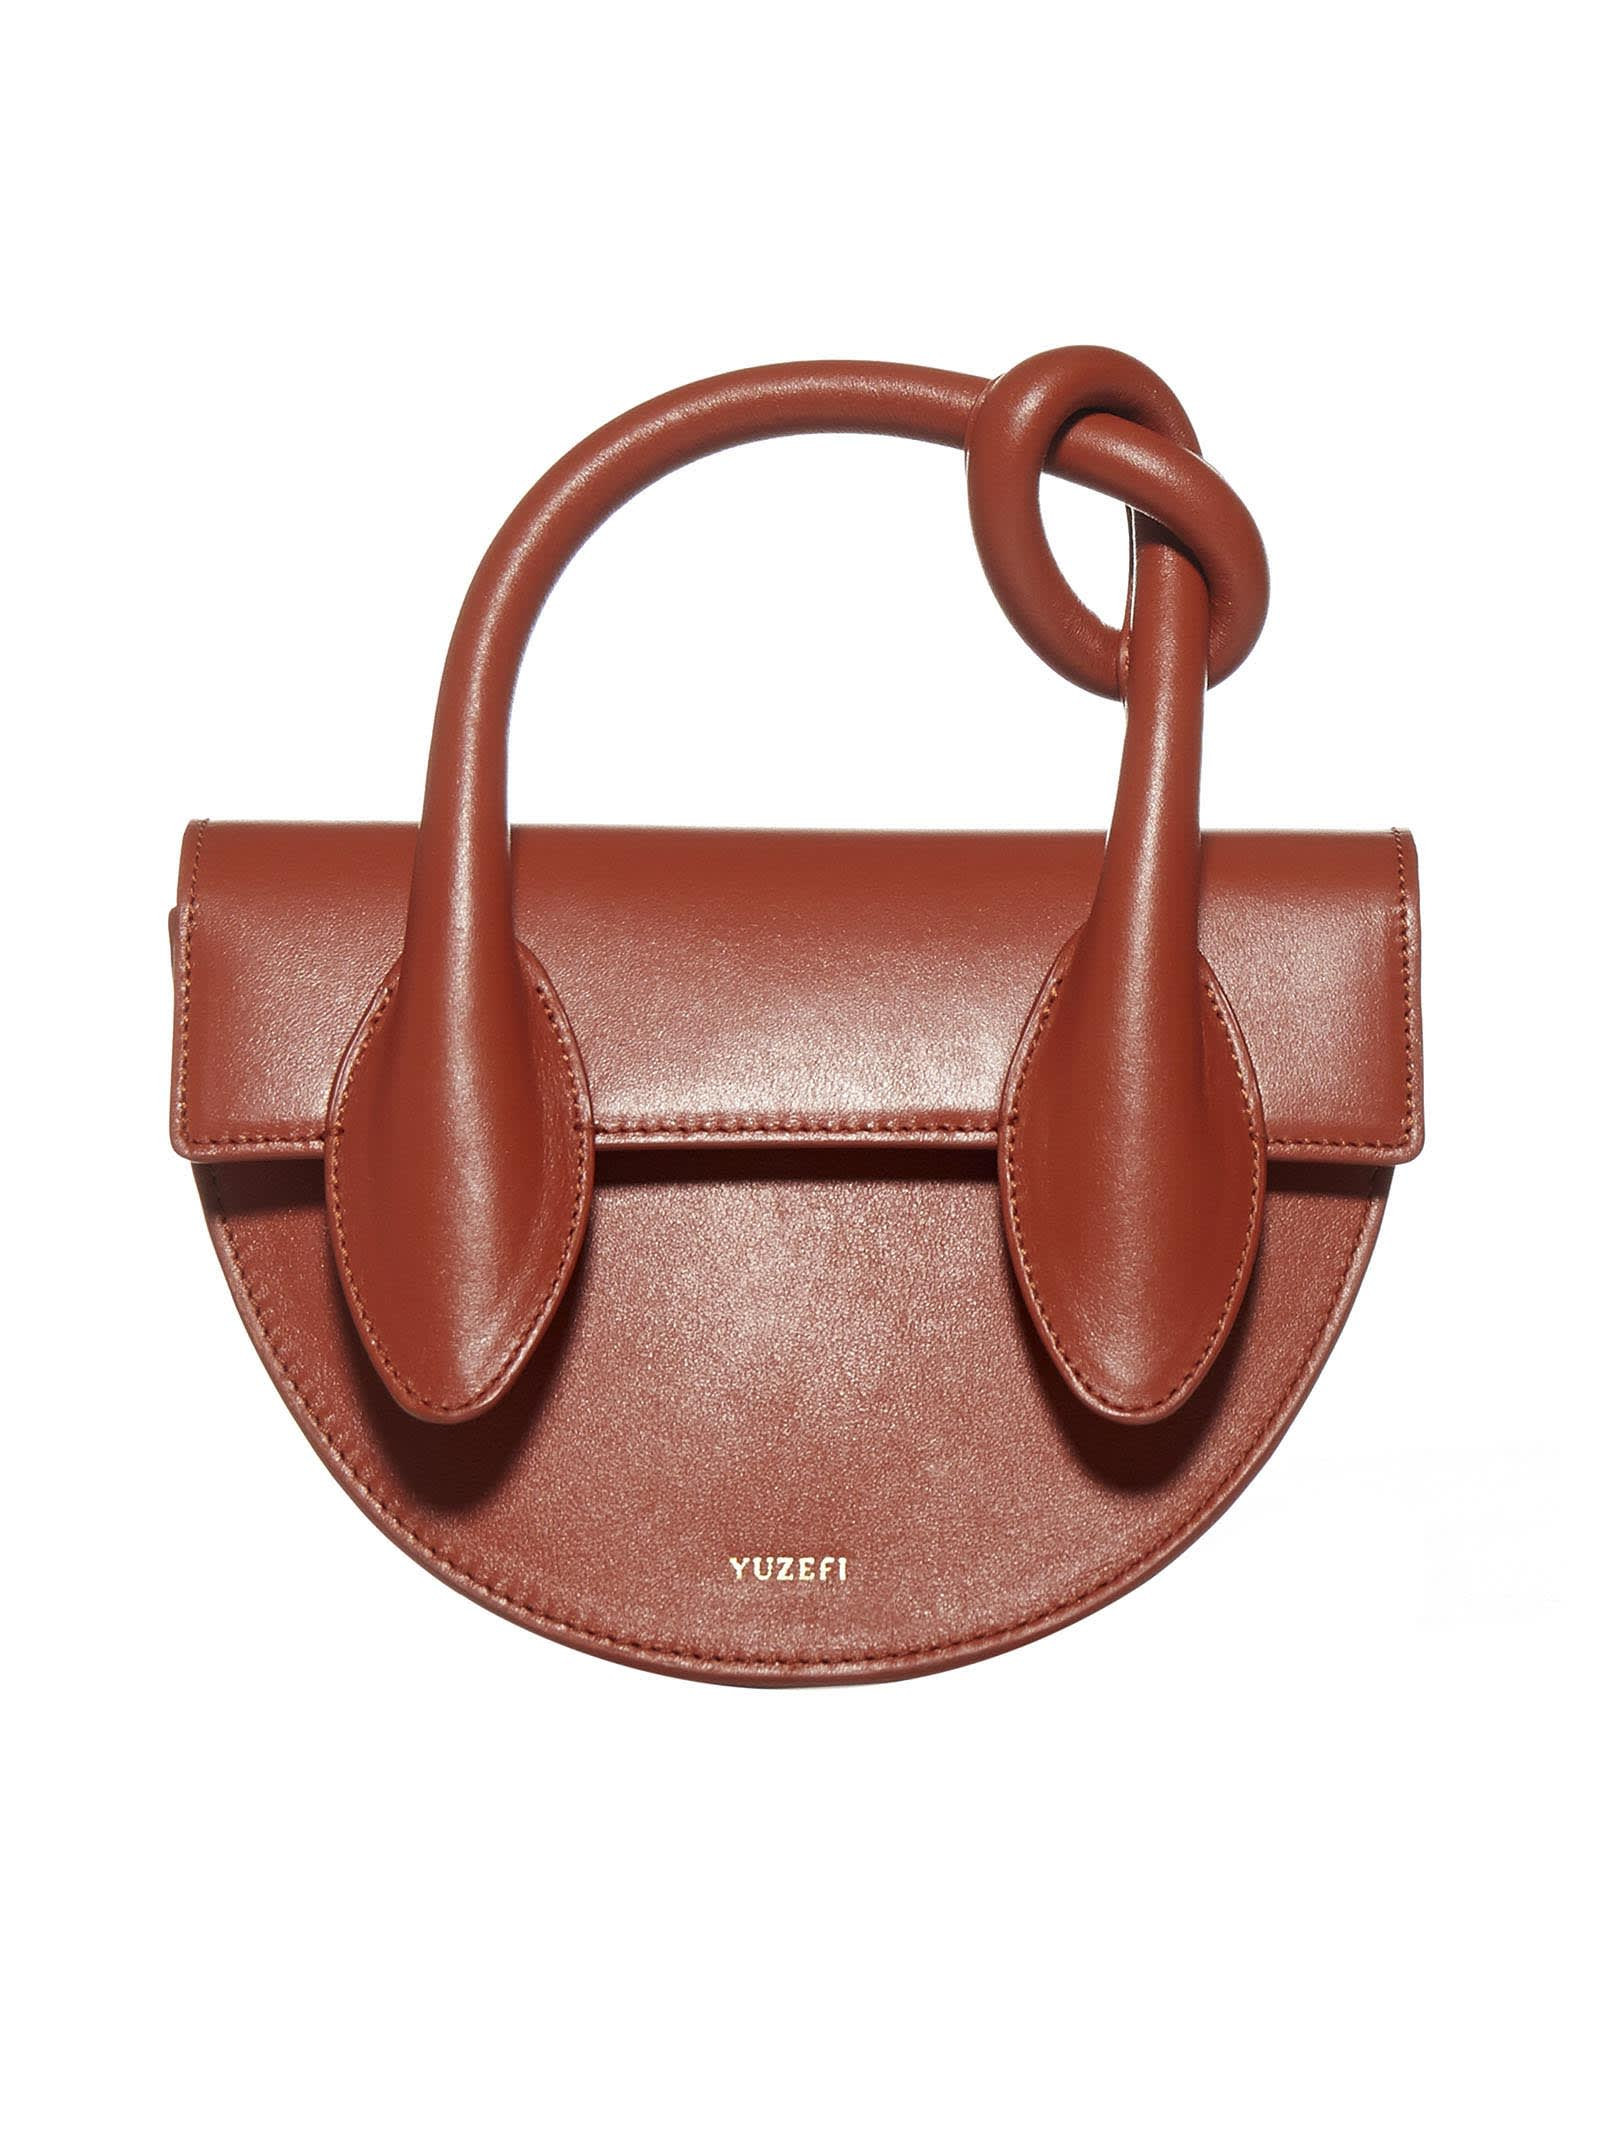 YUZEFI Dolores Leather Bag